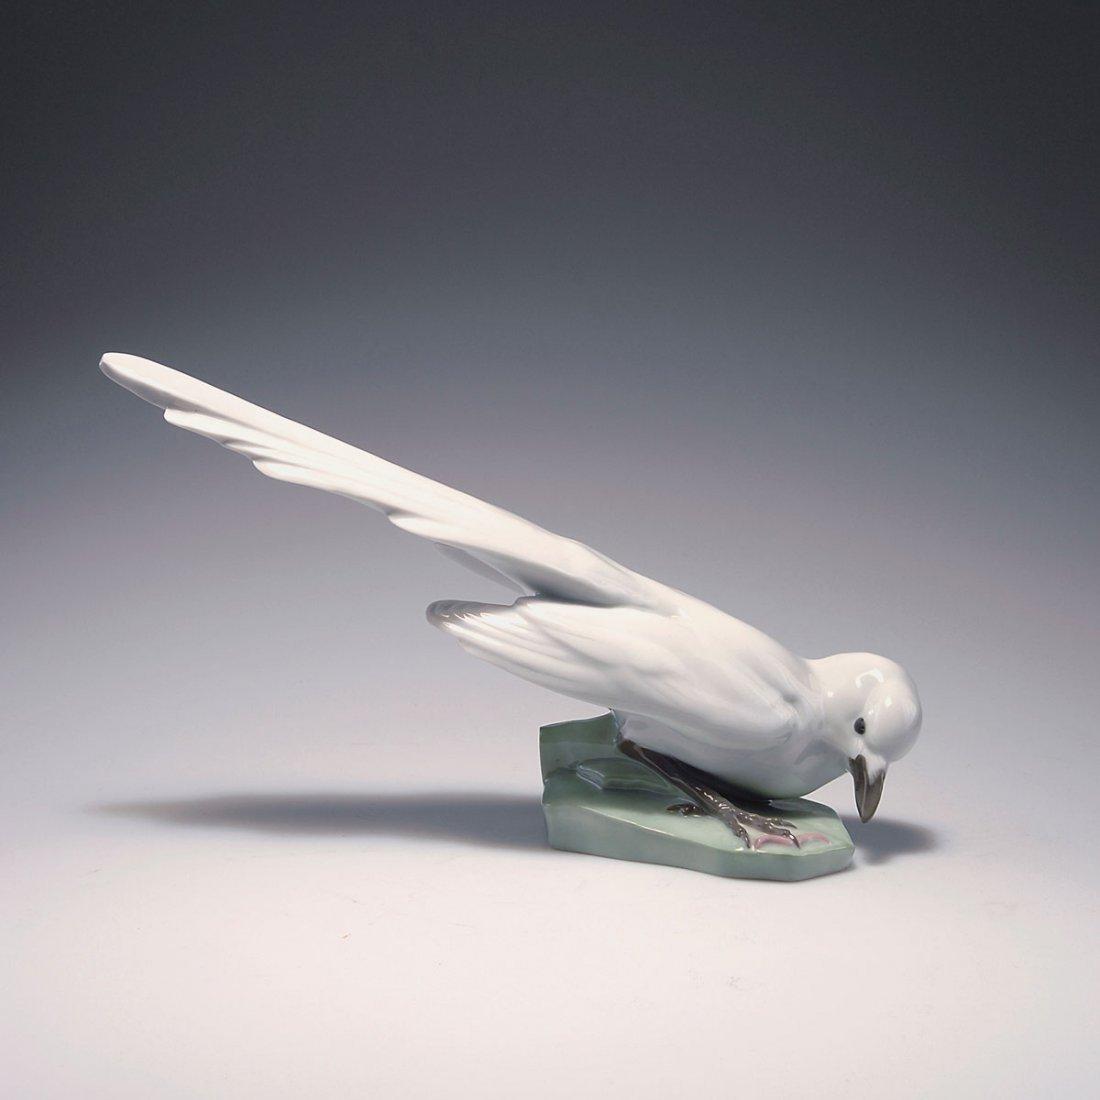 533: Bird with worm, 1920s